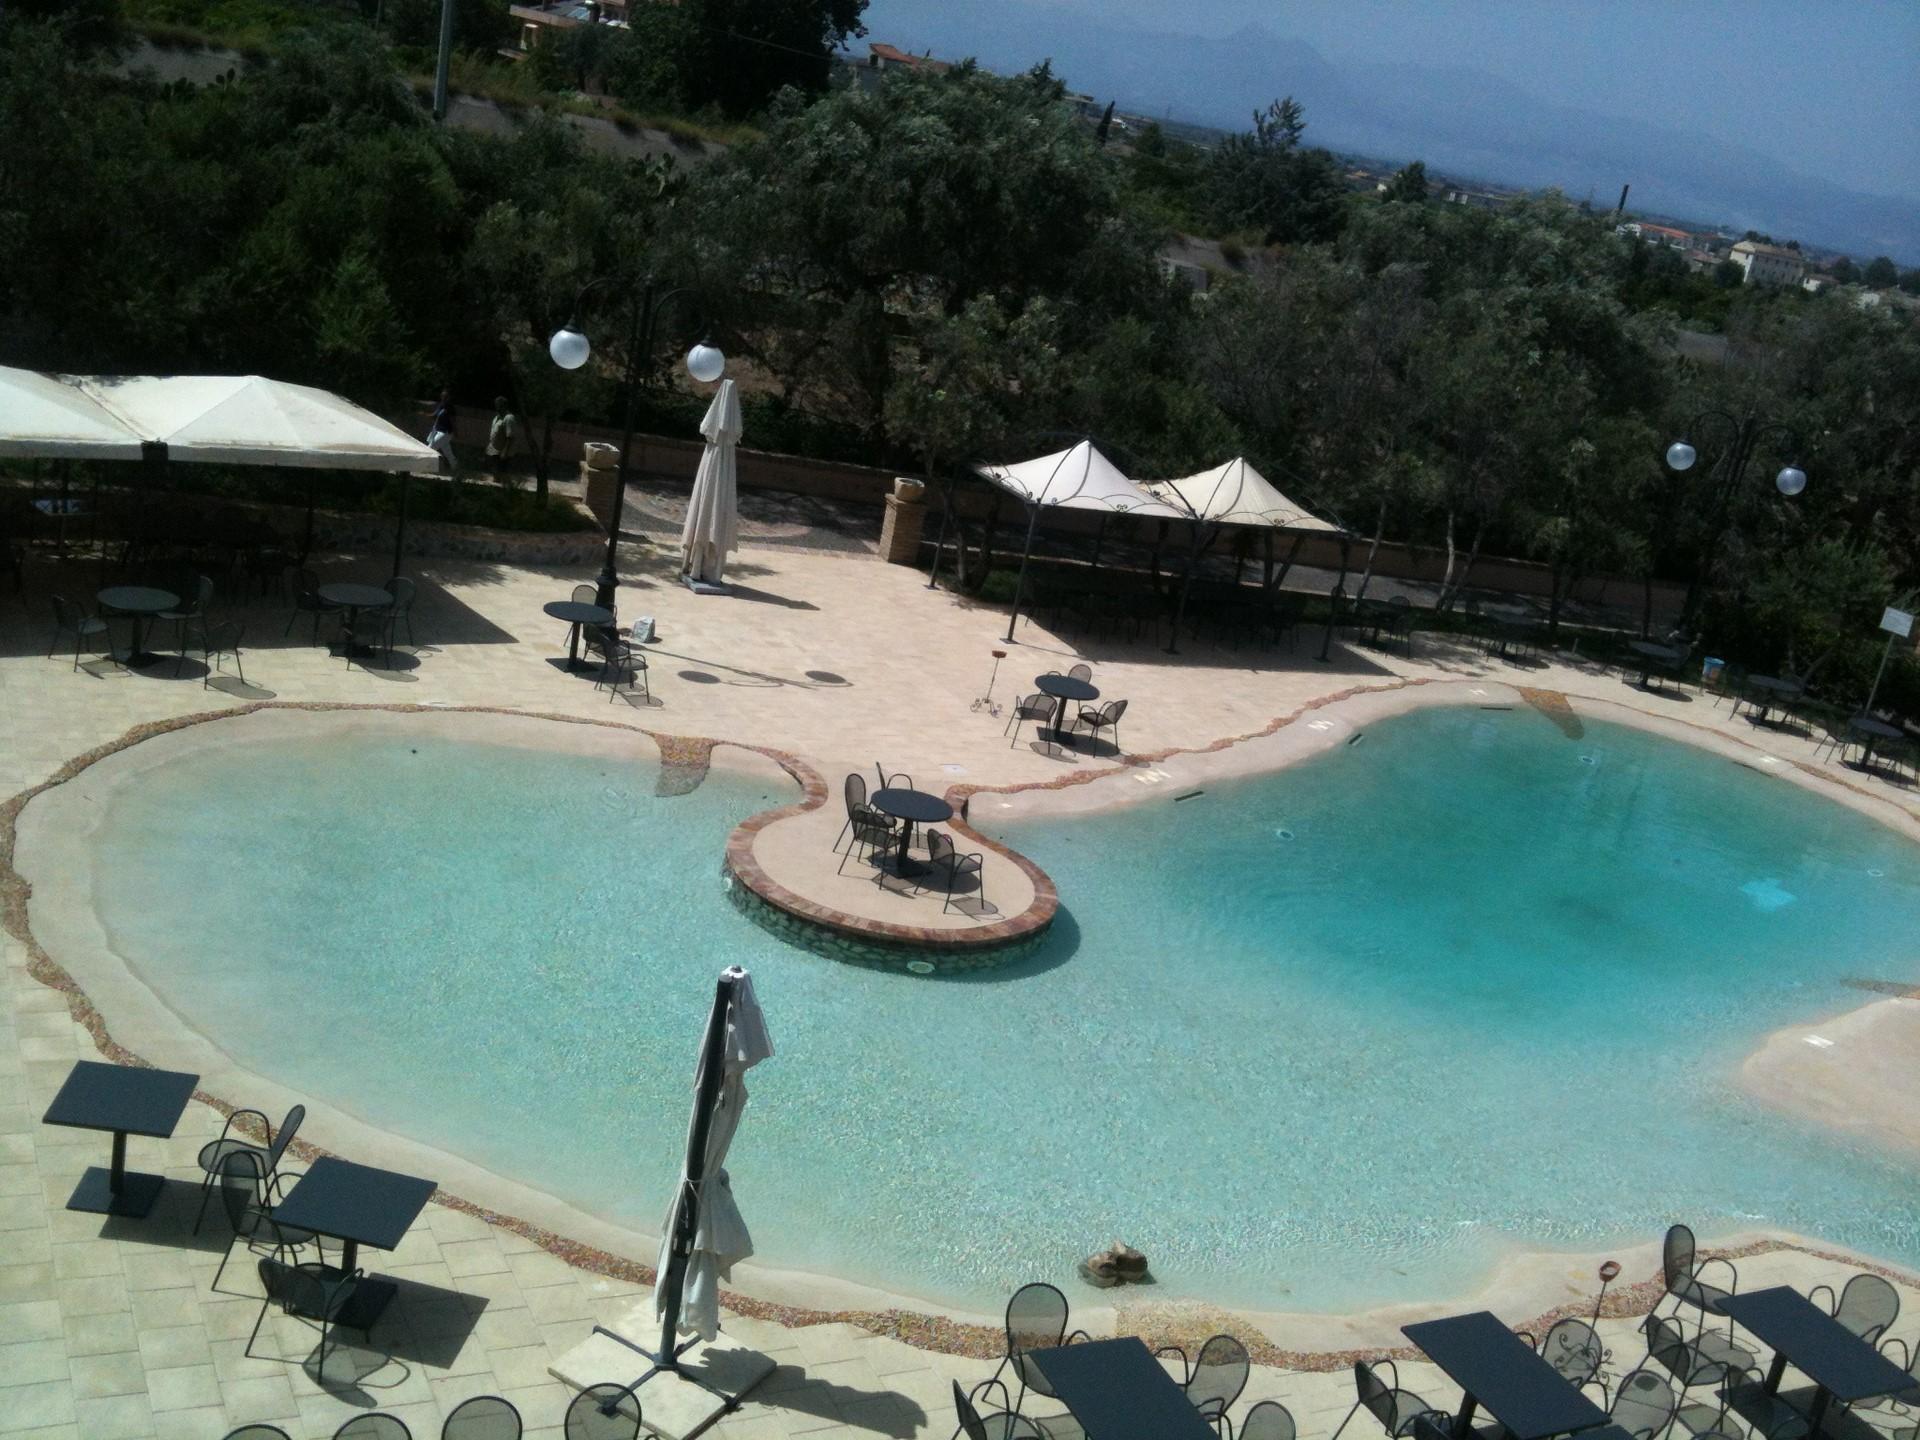 piscina-naturale-biodesign-140